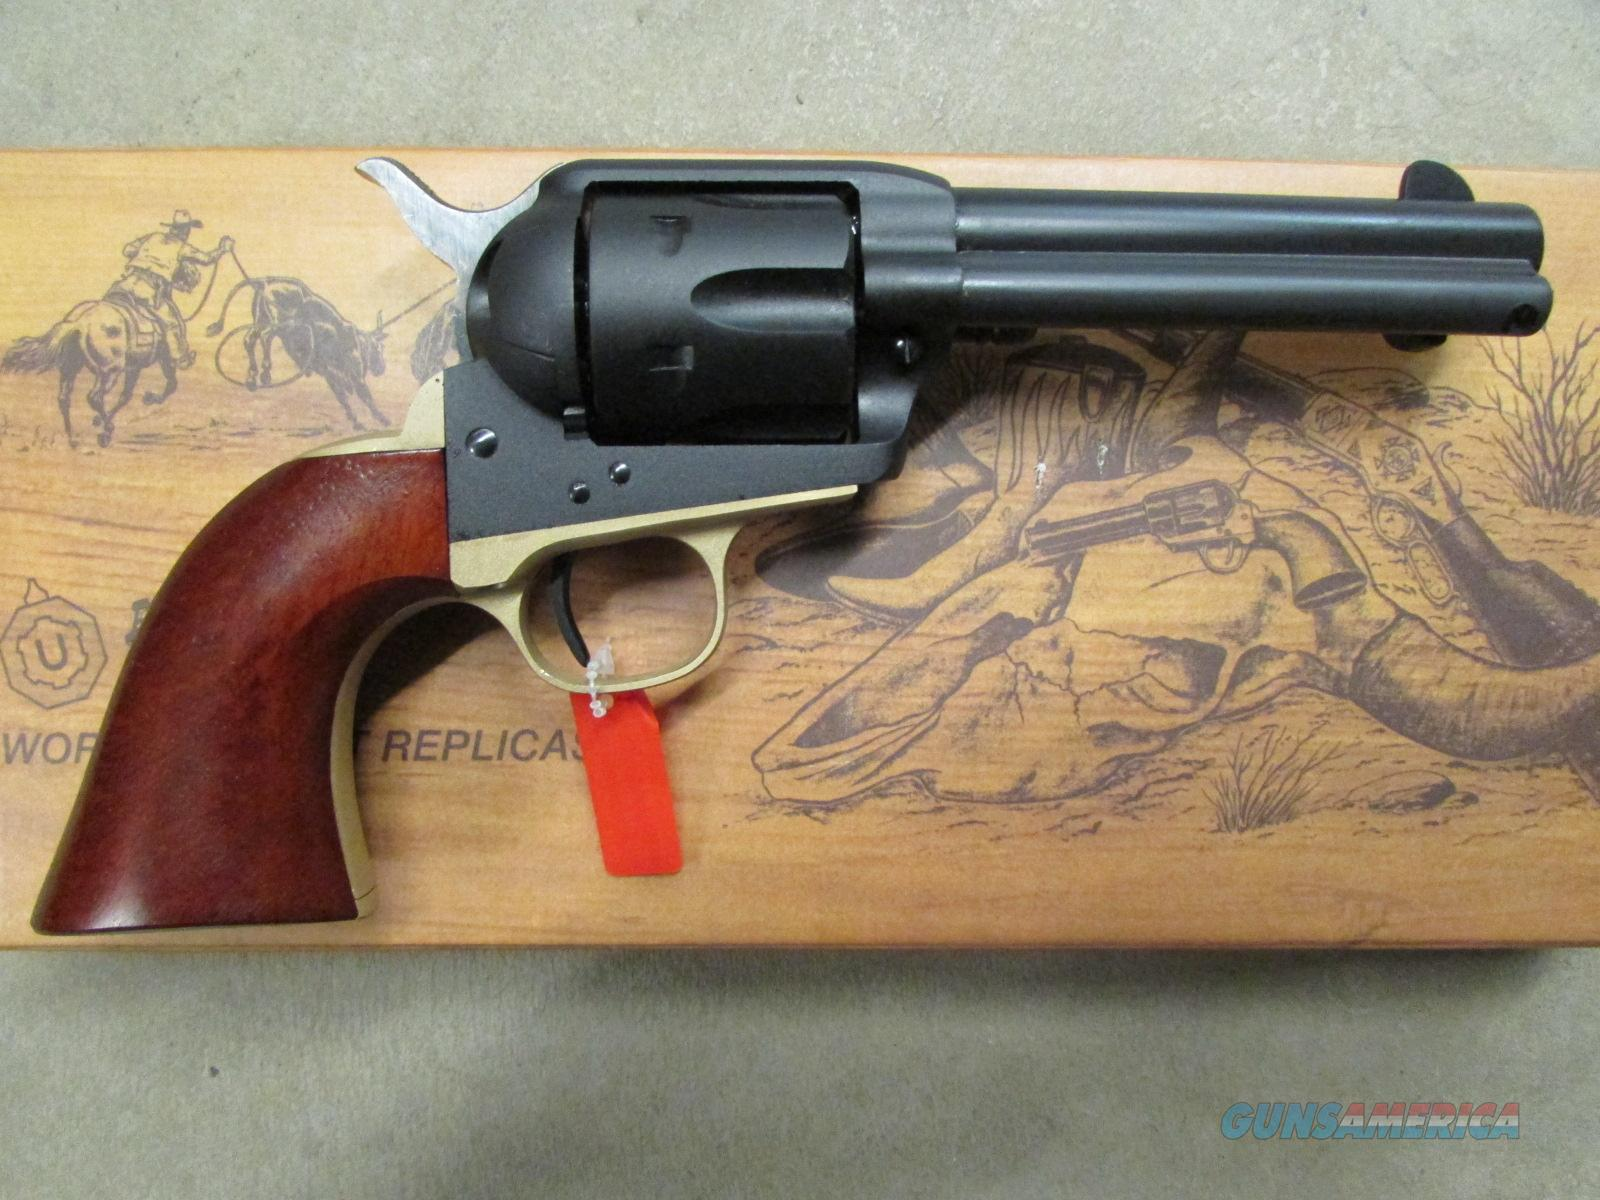 Chiappa 1873-22 Combo Single Action Revolver .22LR & .22 Magnum Guns ...